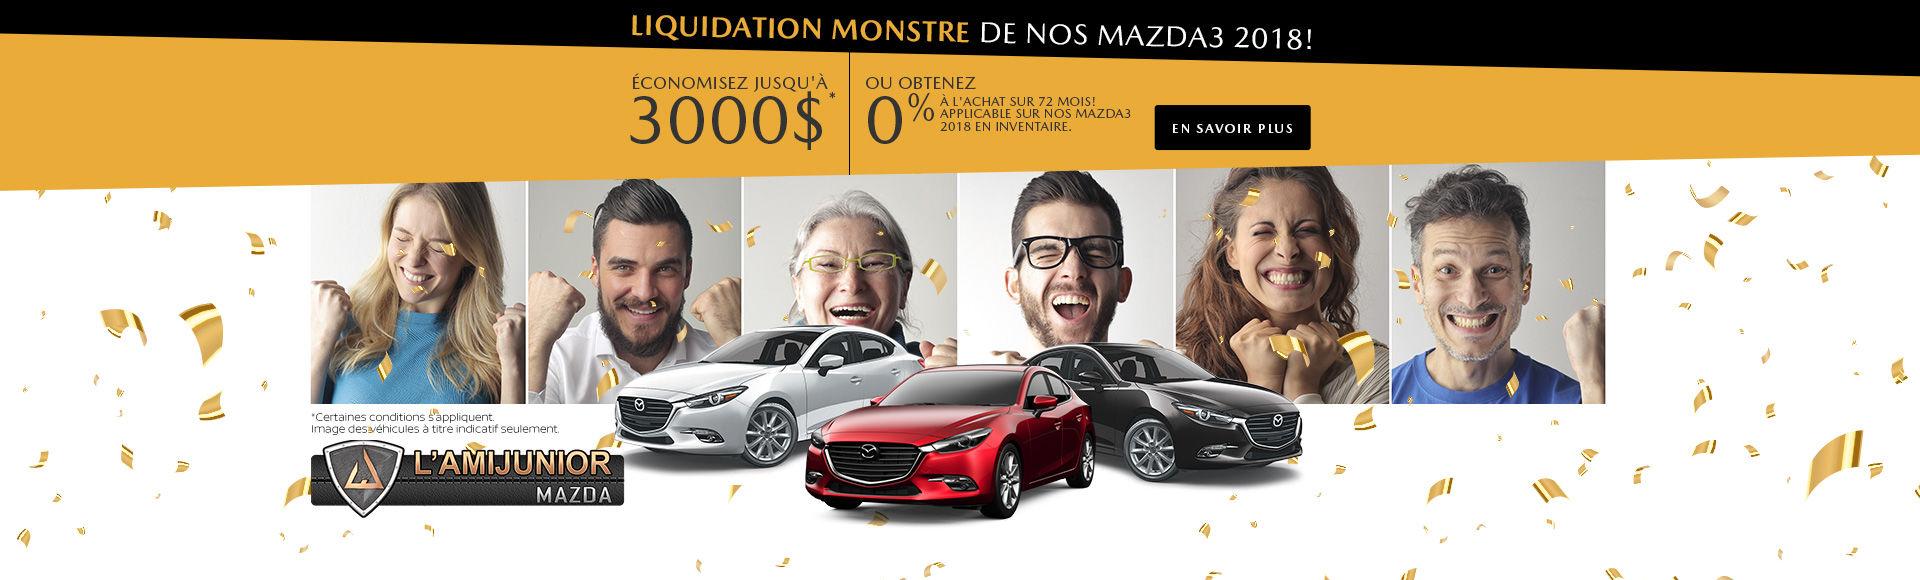 Liquidation monstre de nos Mazda 3 2018